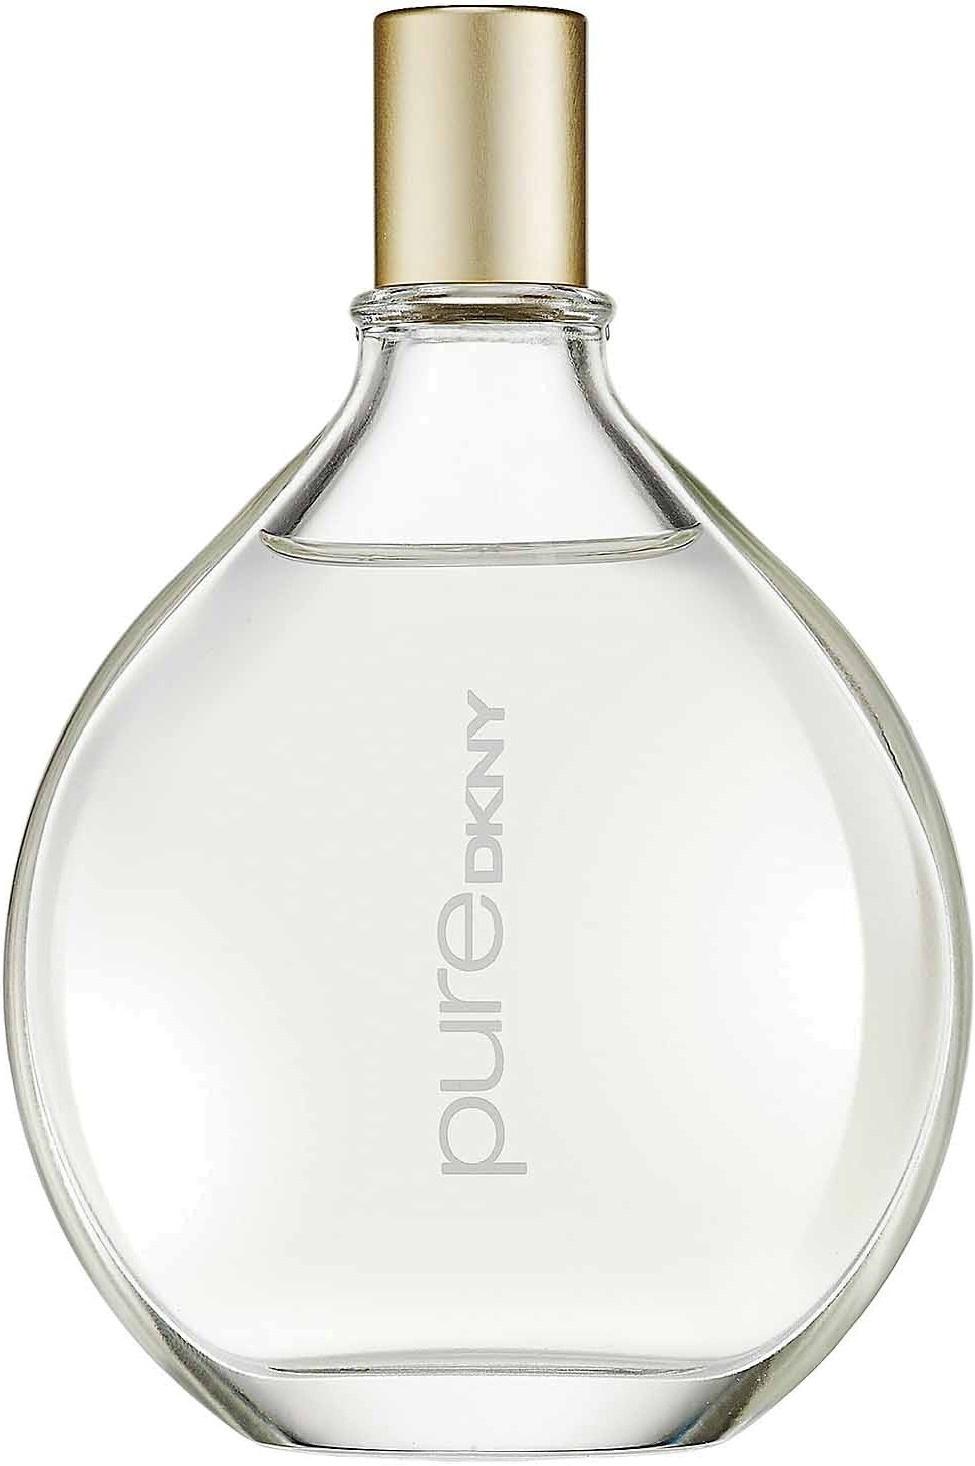 Donna Karan Pure Vanilla парфюмированная вода 100мл (Донна Каран Чистая Ваниль)